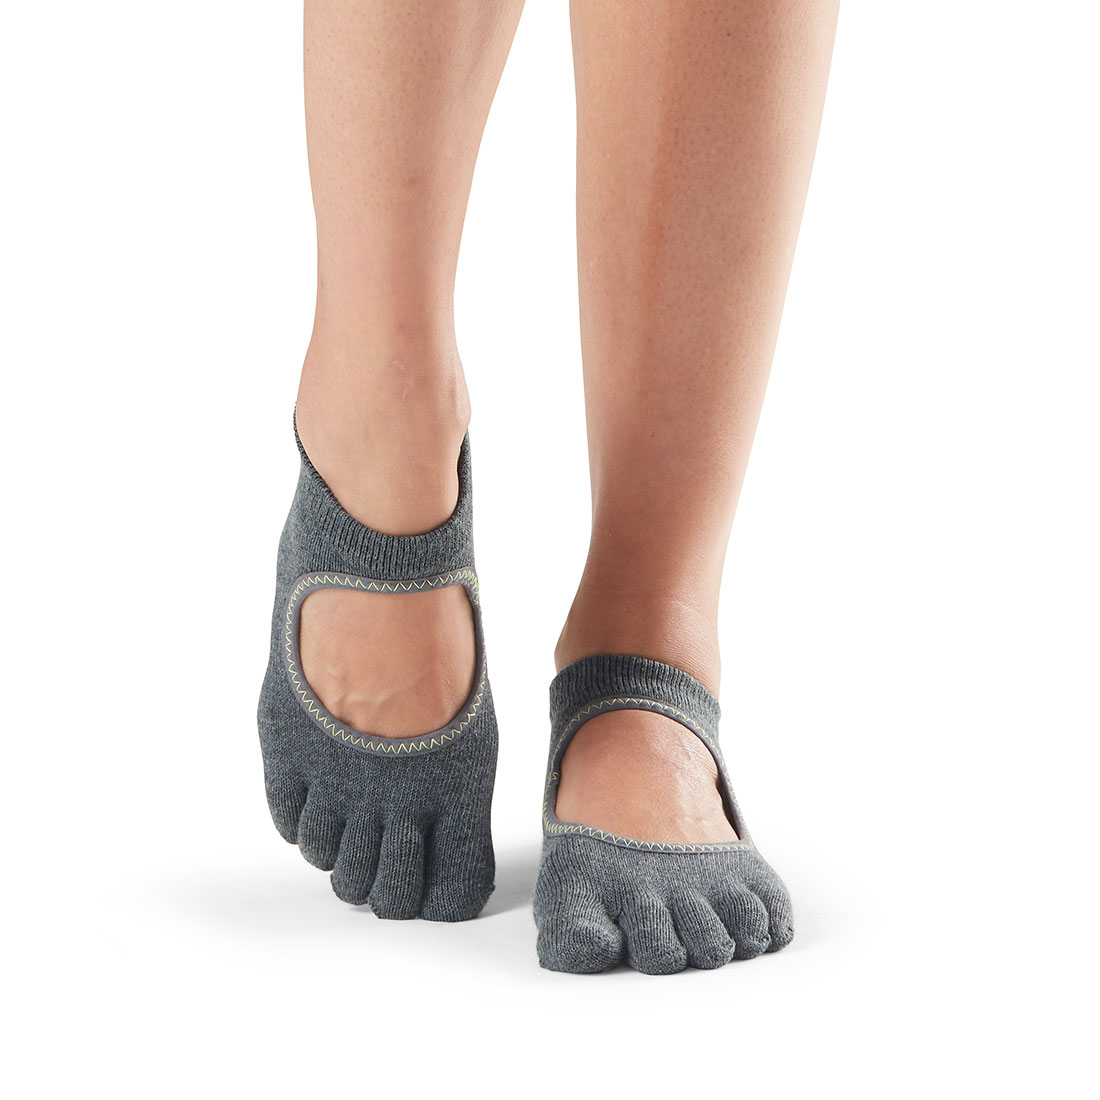 Yogasocken ToeSox Bellarina Full Toe Charcoal Grey w/lime - 1